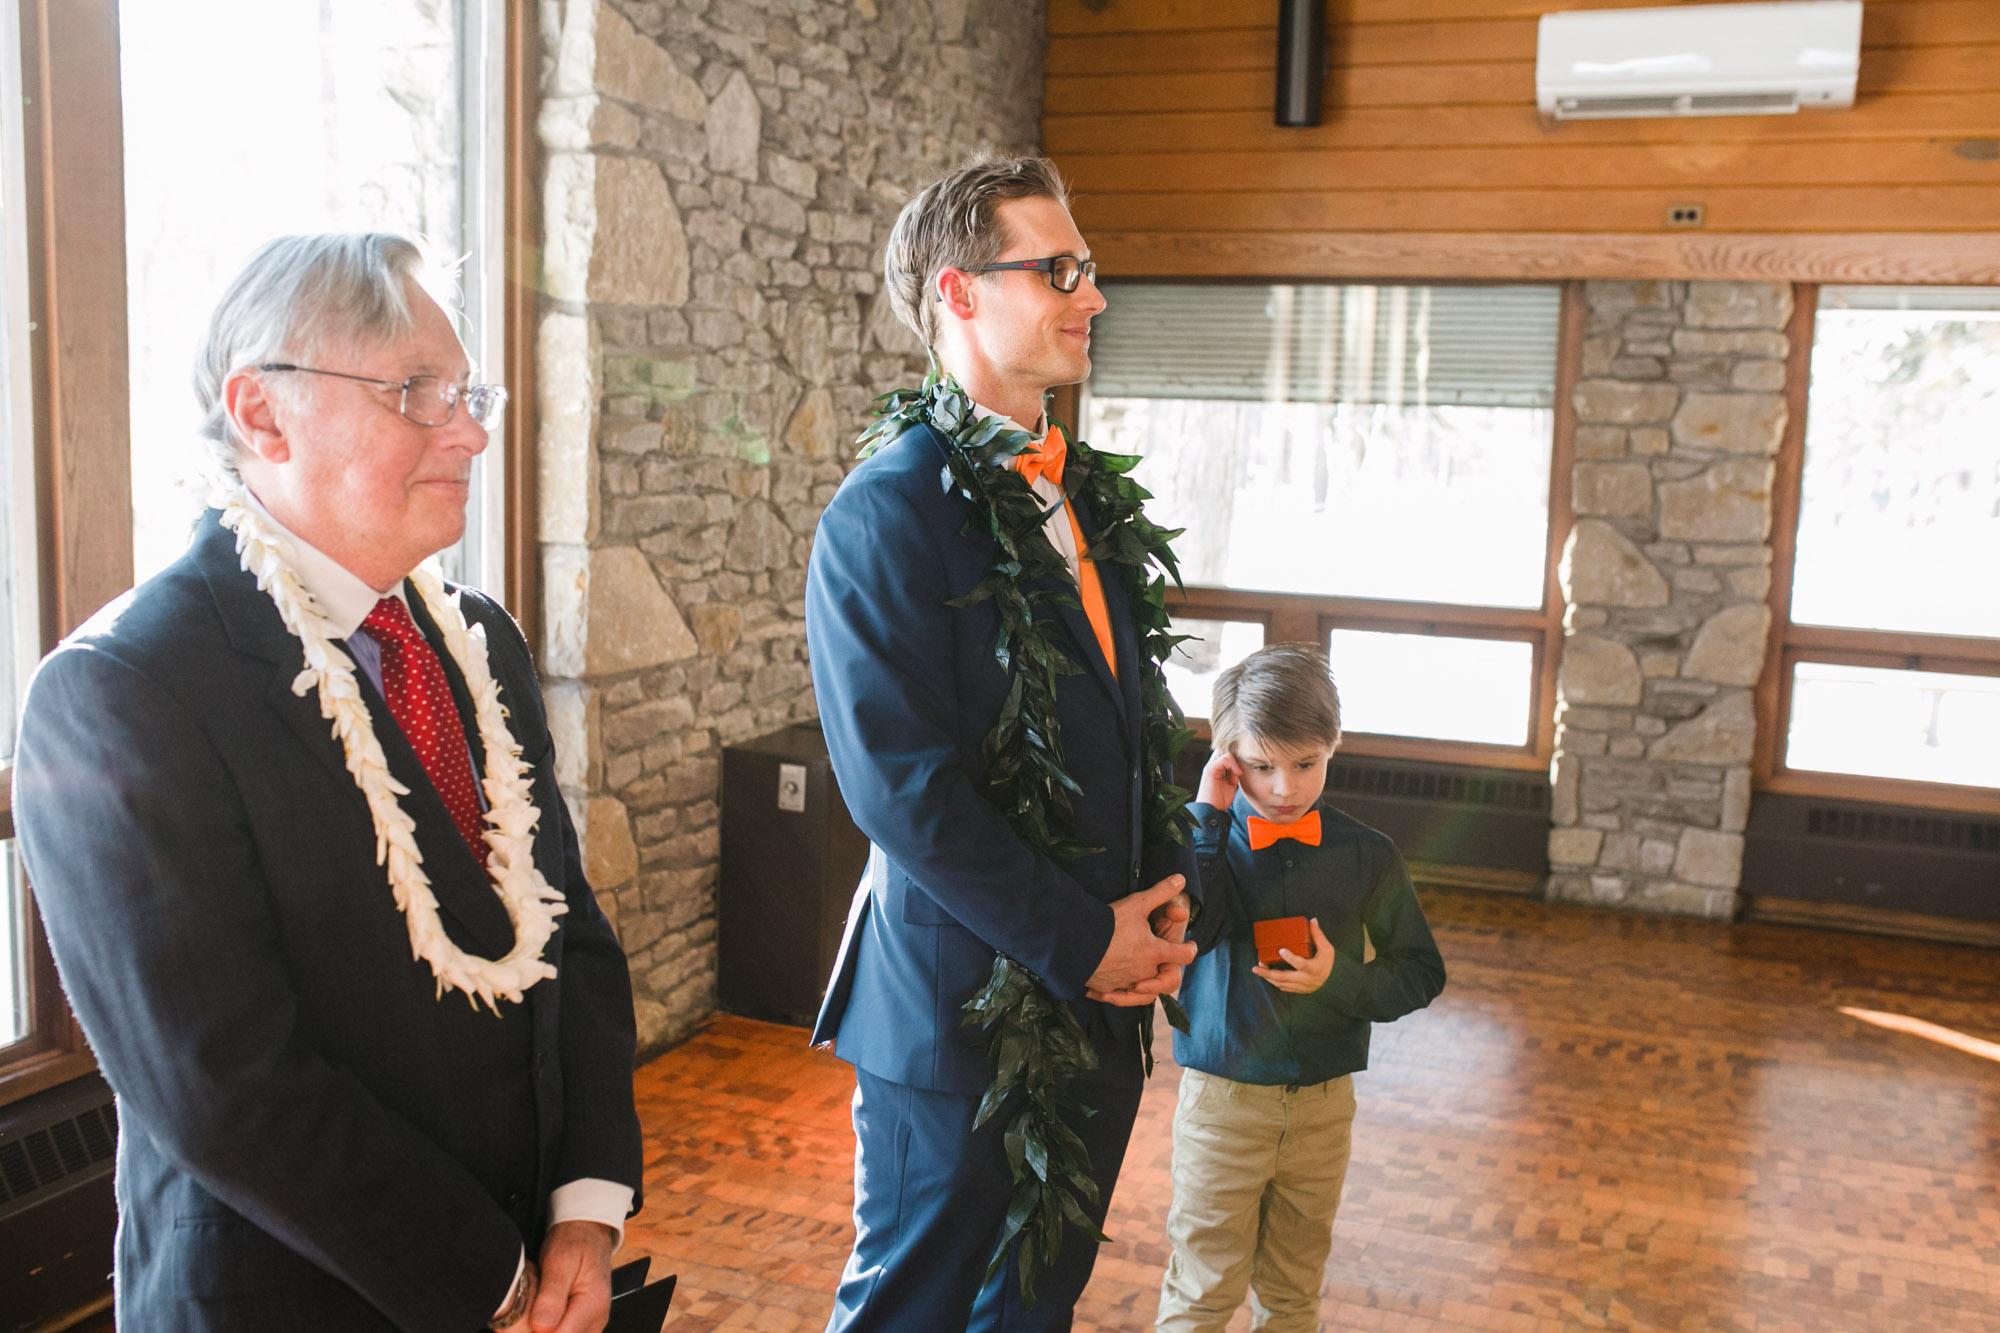 oak-openings-lodge-wedding-6688.jpg